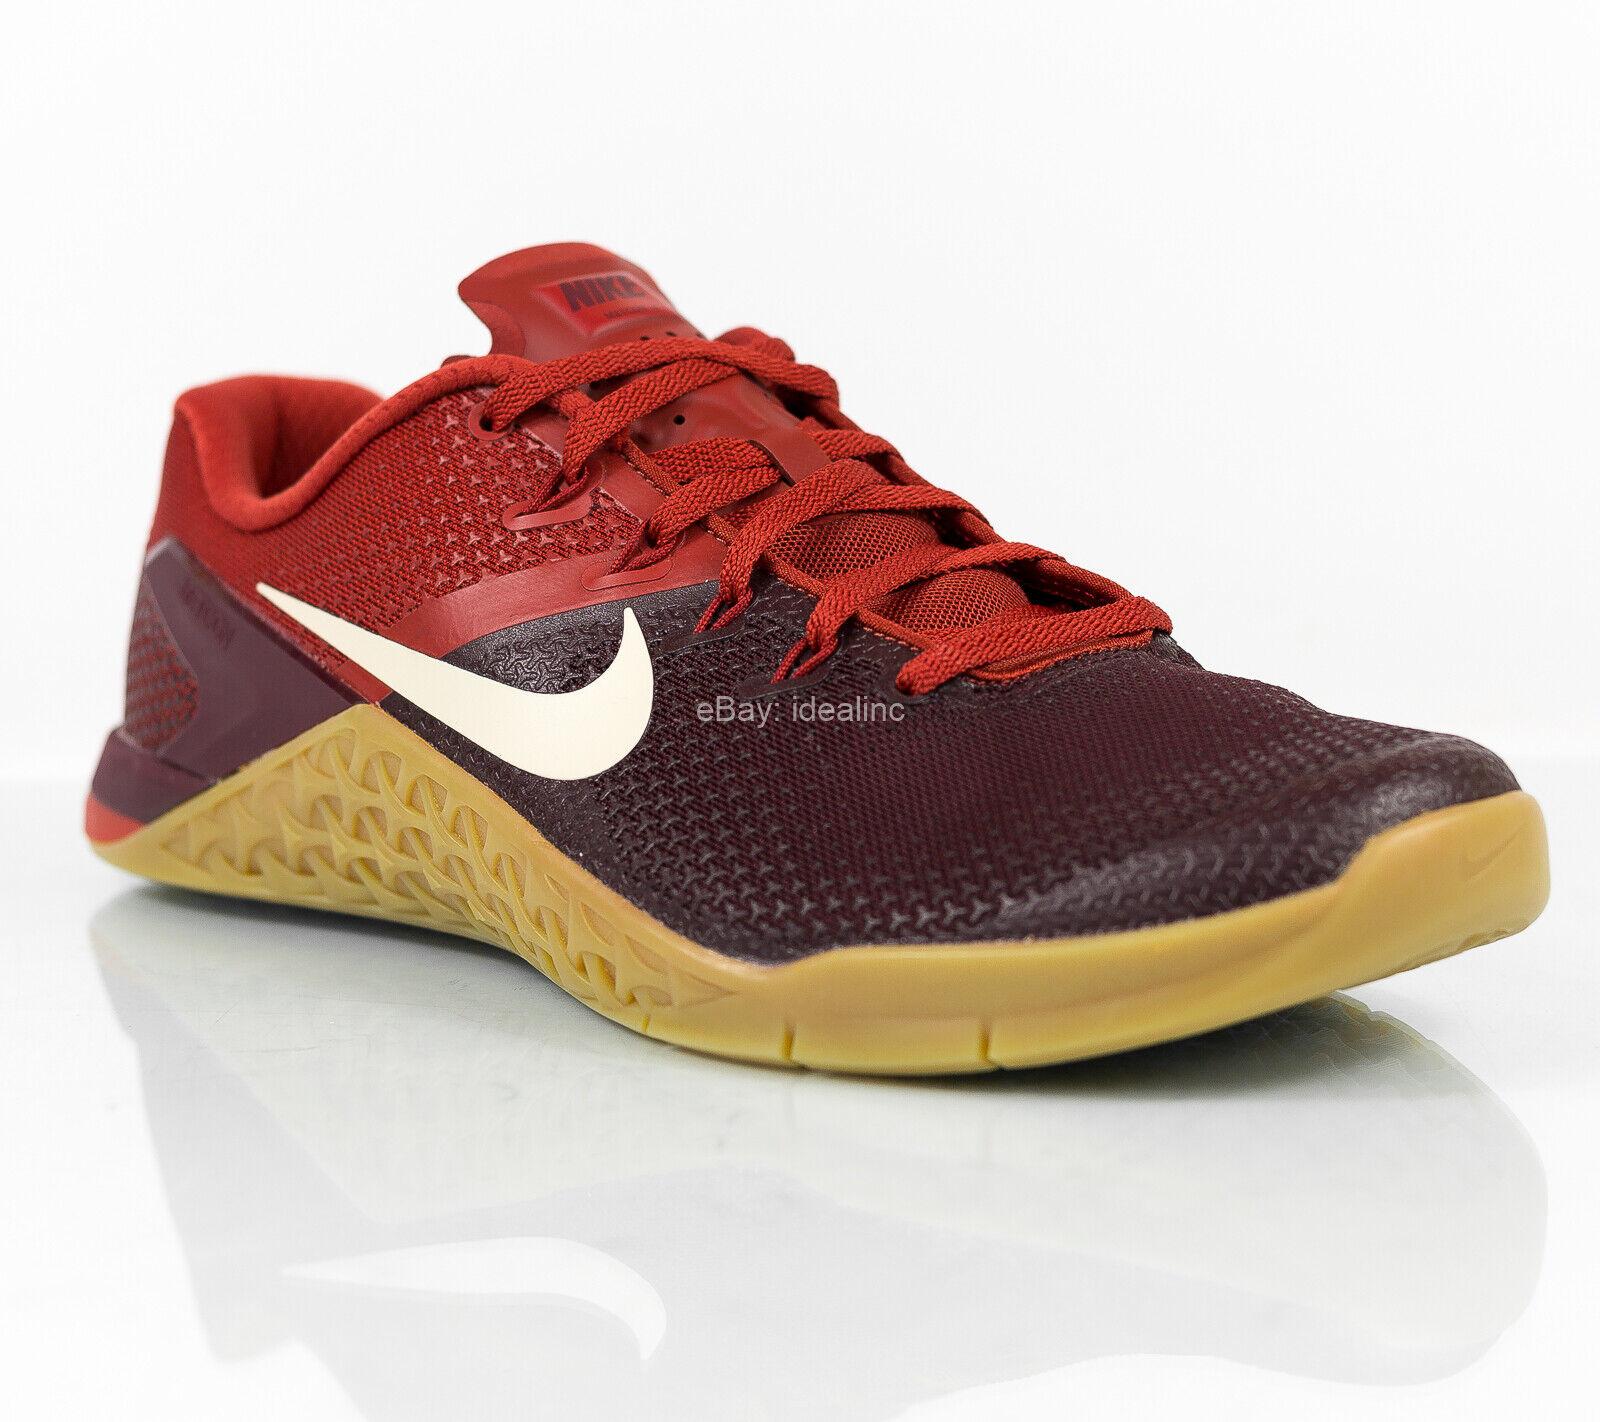 Nike Metcon 4 Men's Training Shoes Size